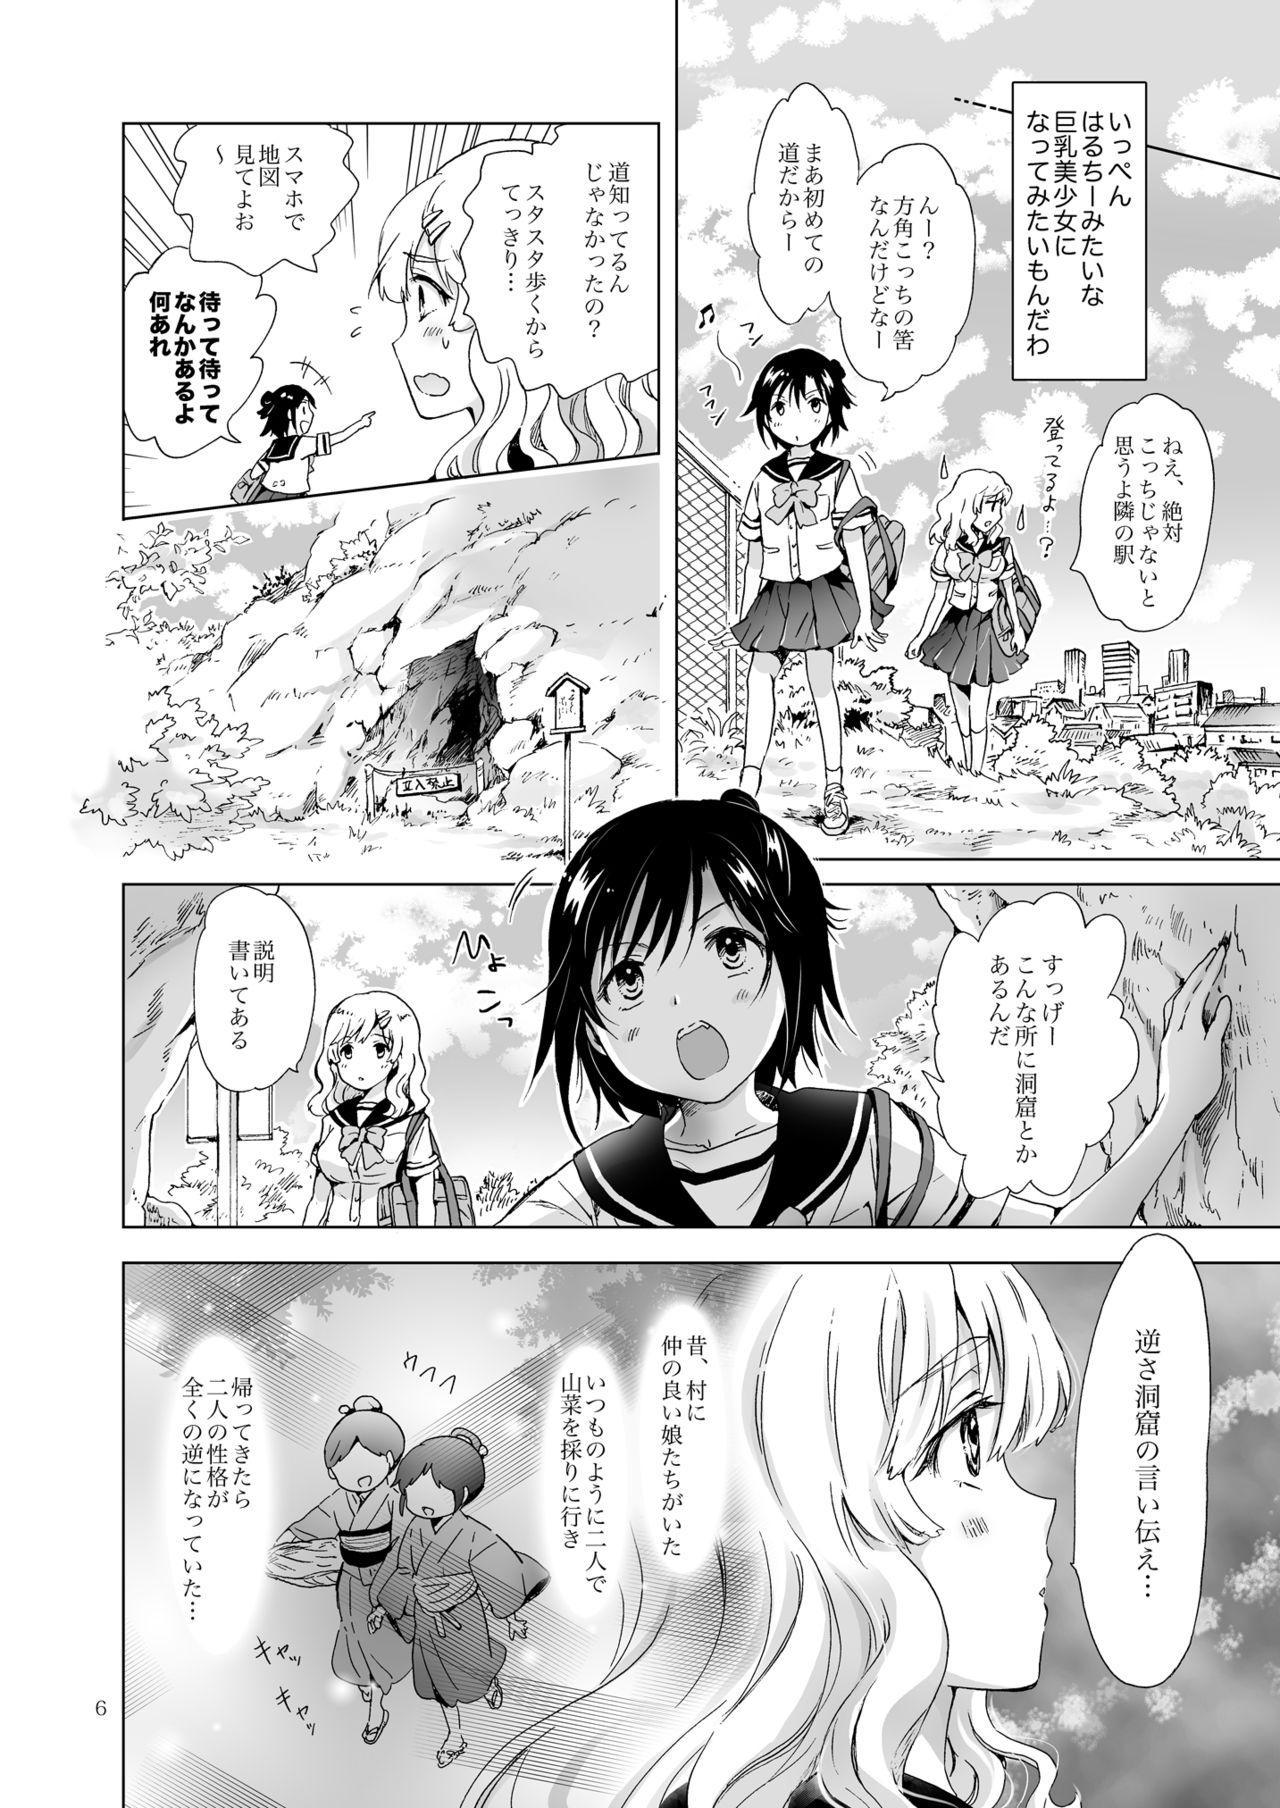 [peachpulsar (Mira)] Oppai-chan to chippai-chan ga irekawaru hanashi [Digital] 4